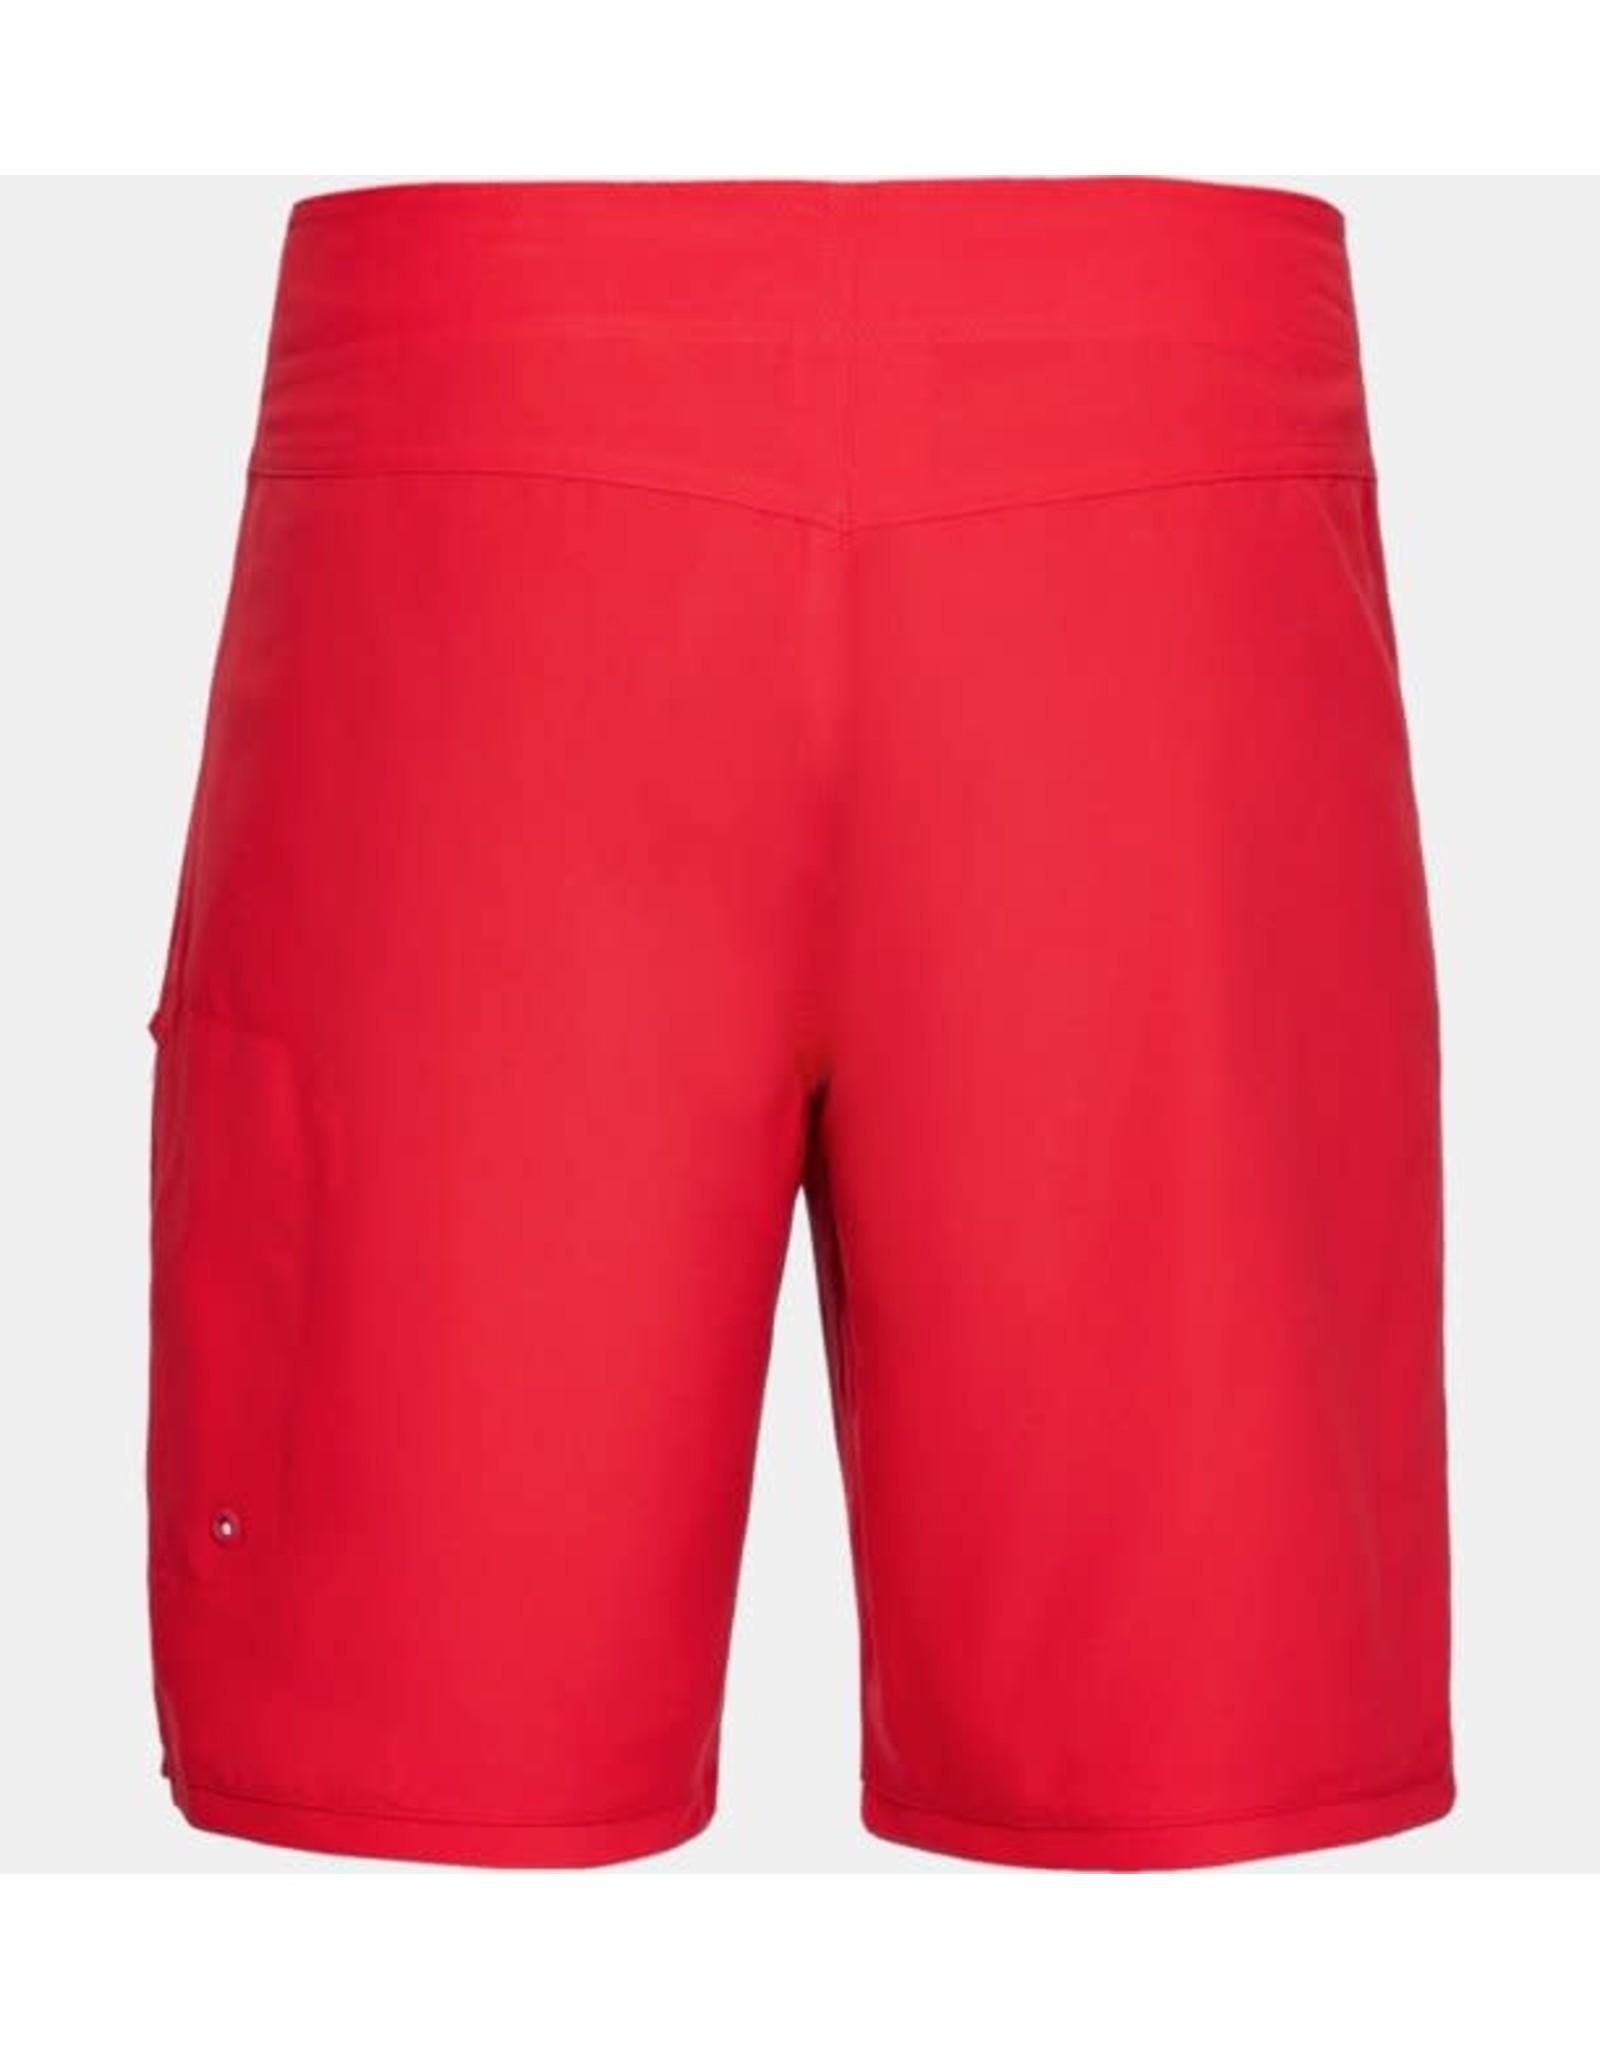 Under Armour Shore Break Emboss Boardshort - red